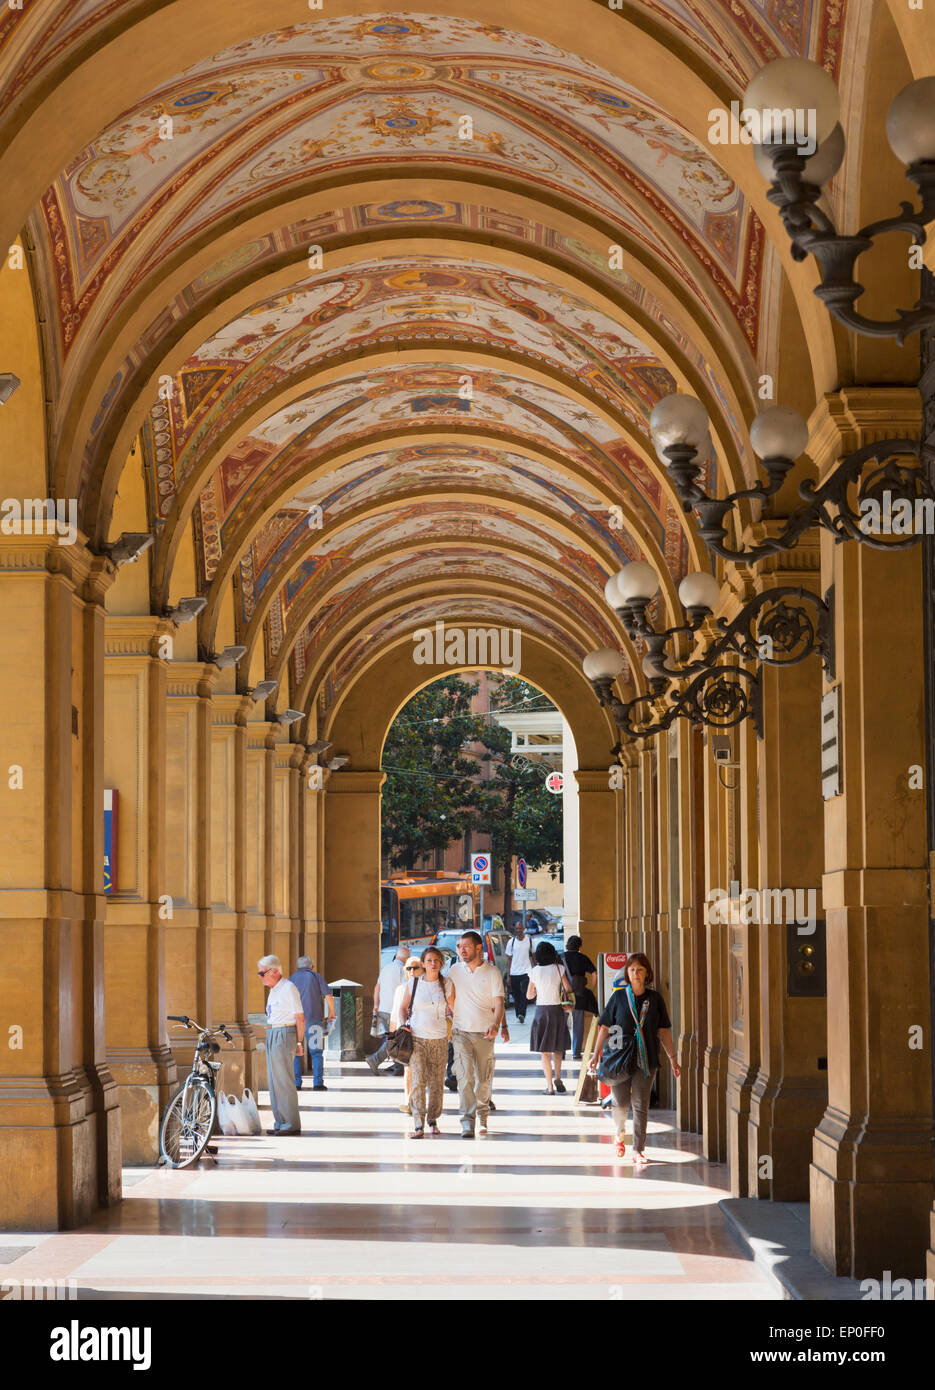 Bologna, Emilia-Romagna, Italy. The shopping arcade in Piazza Cavour. Stock Photo